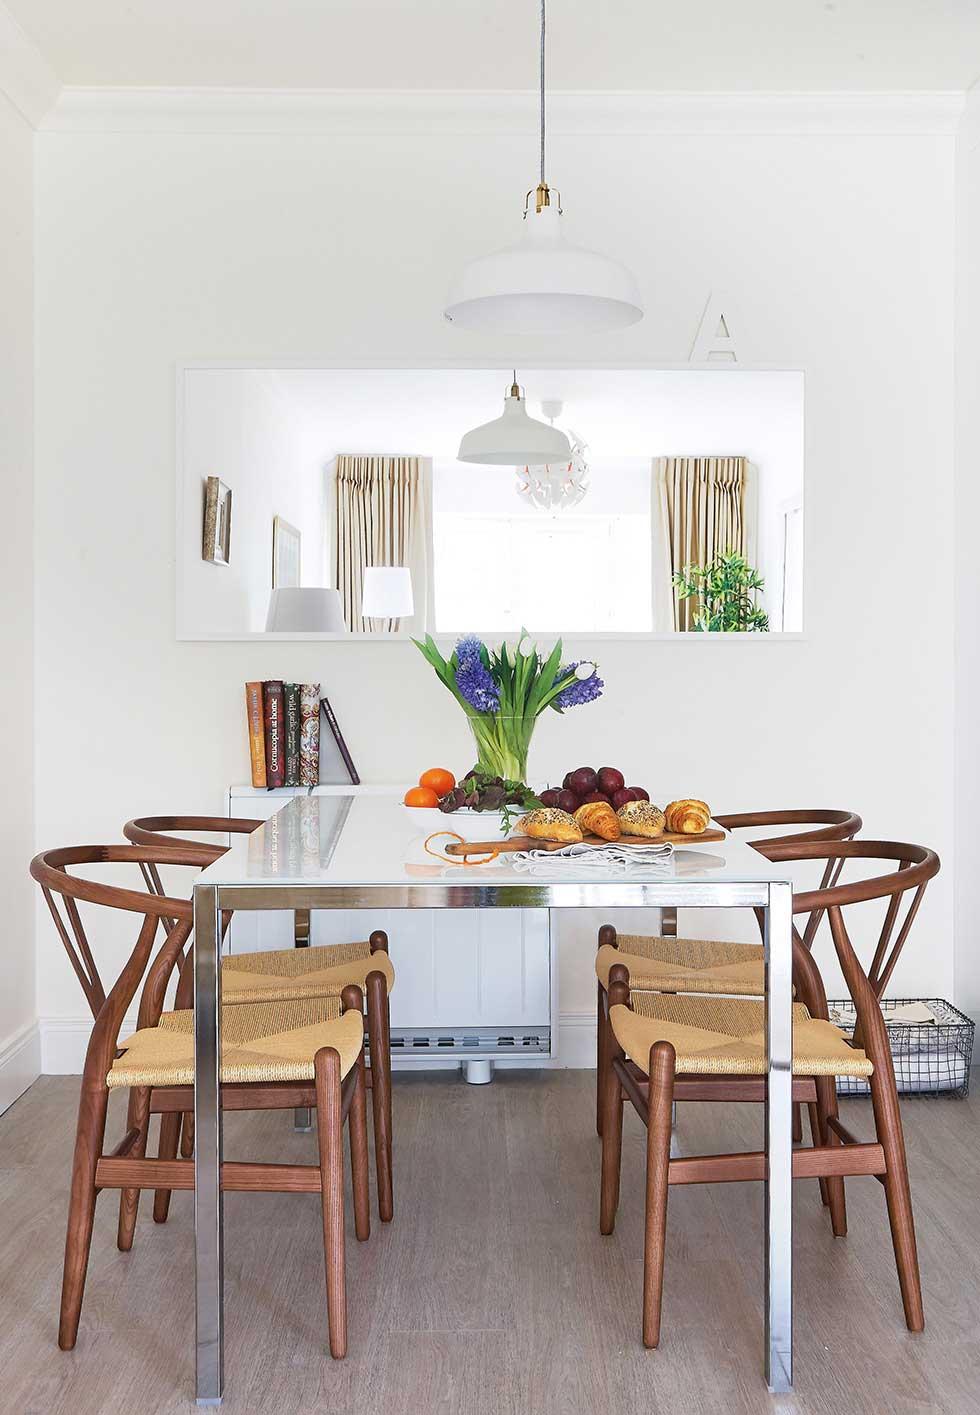 Farbra apartment dining table